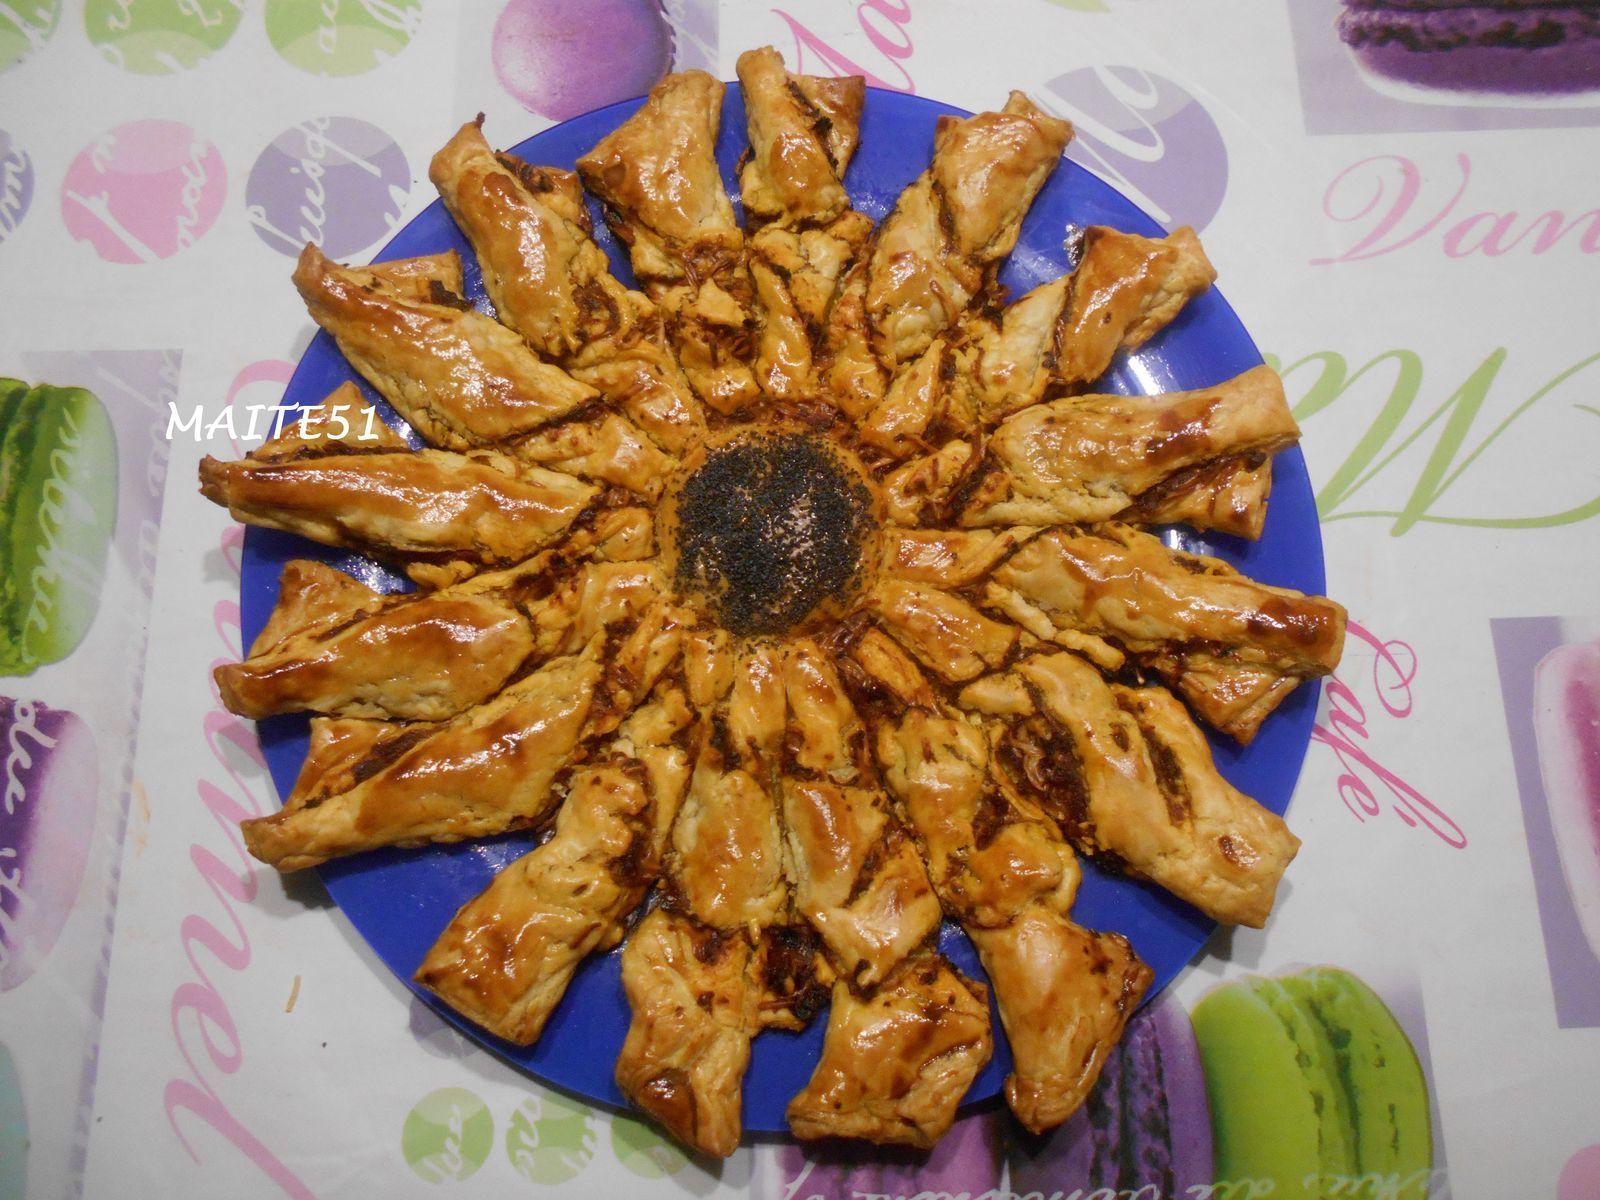 Tarte soleil au pesto rouge a vos fourneaux chez maite51 - Tarte soleil sucree originale ...